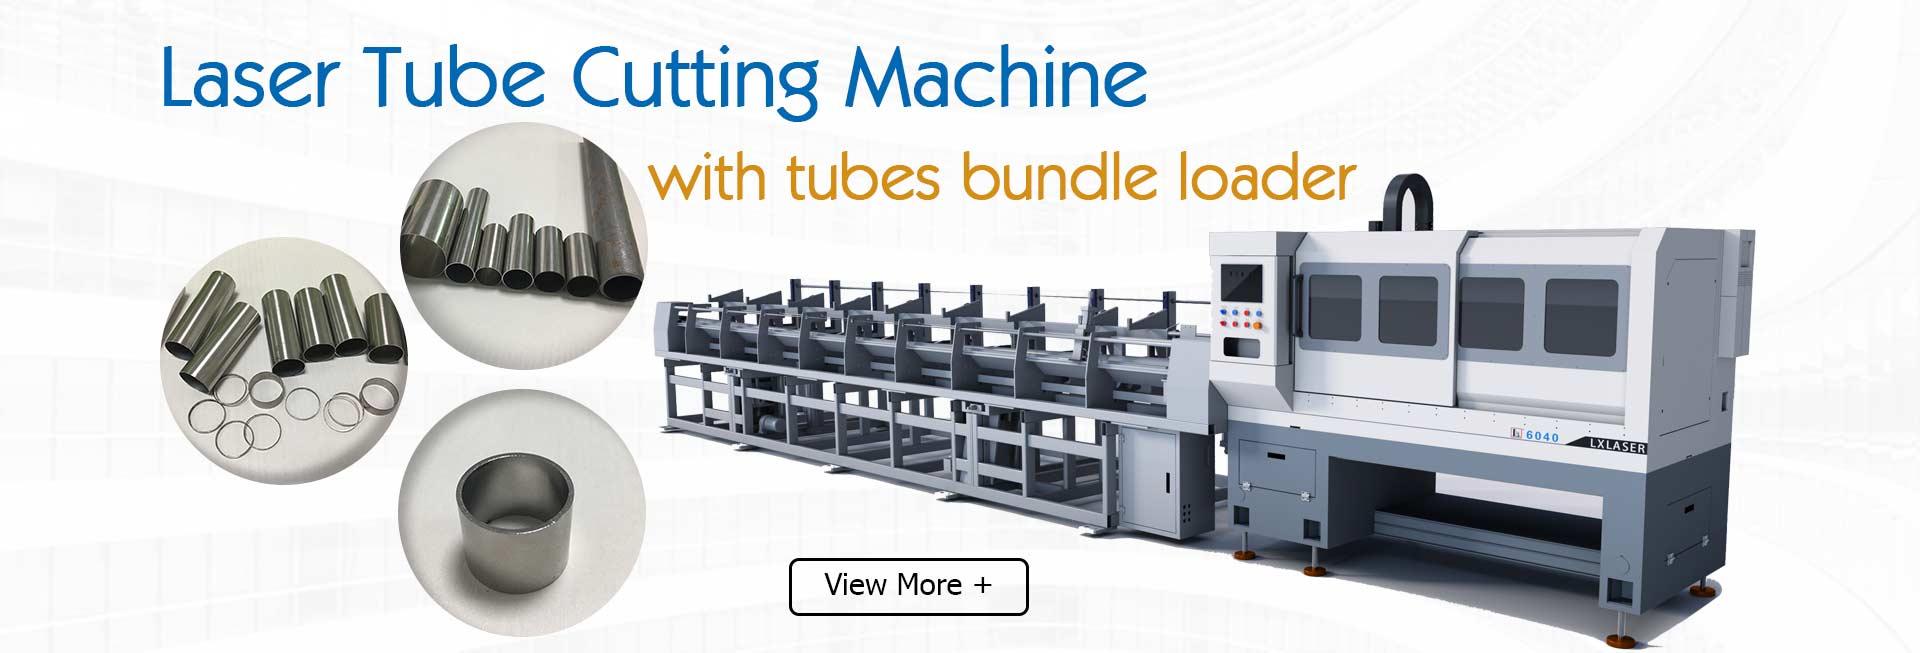 Automatic Bundle Loader Tube Laser Cutting Machine